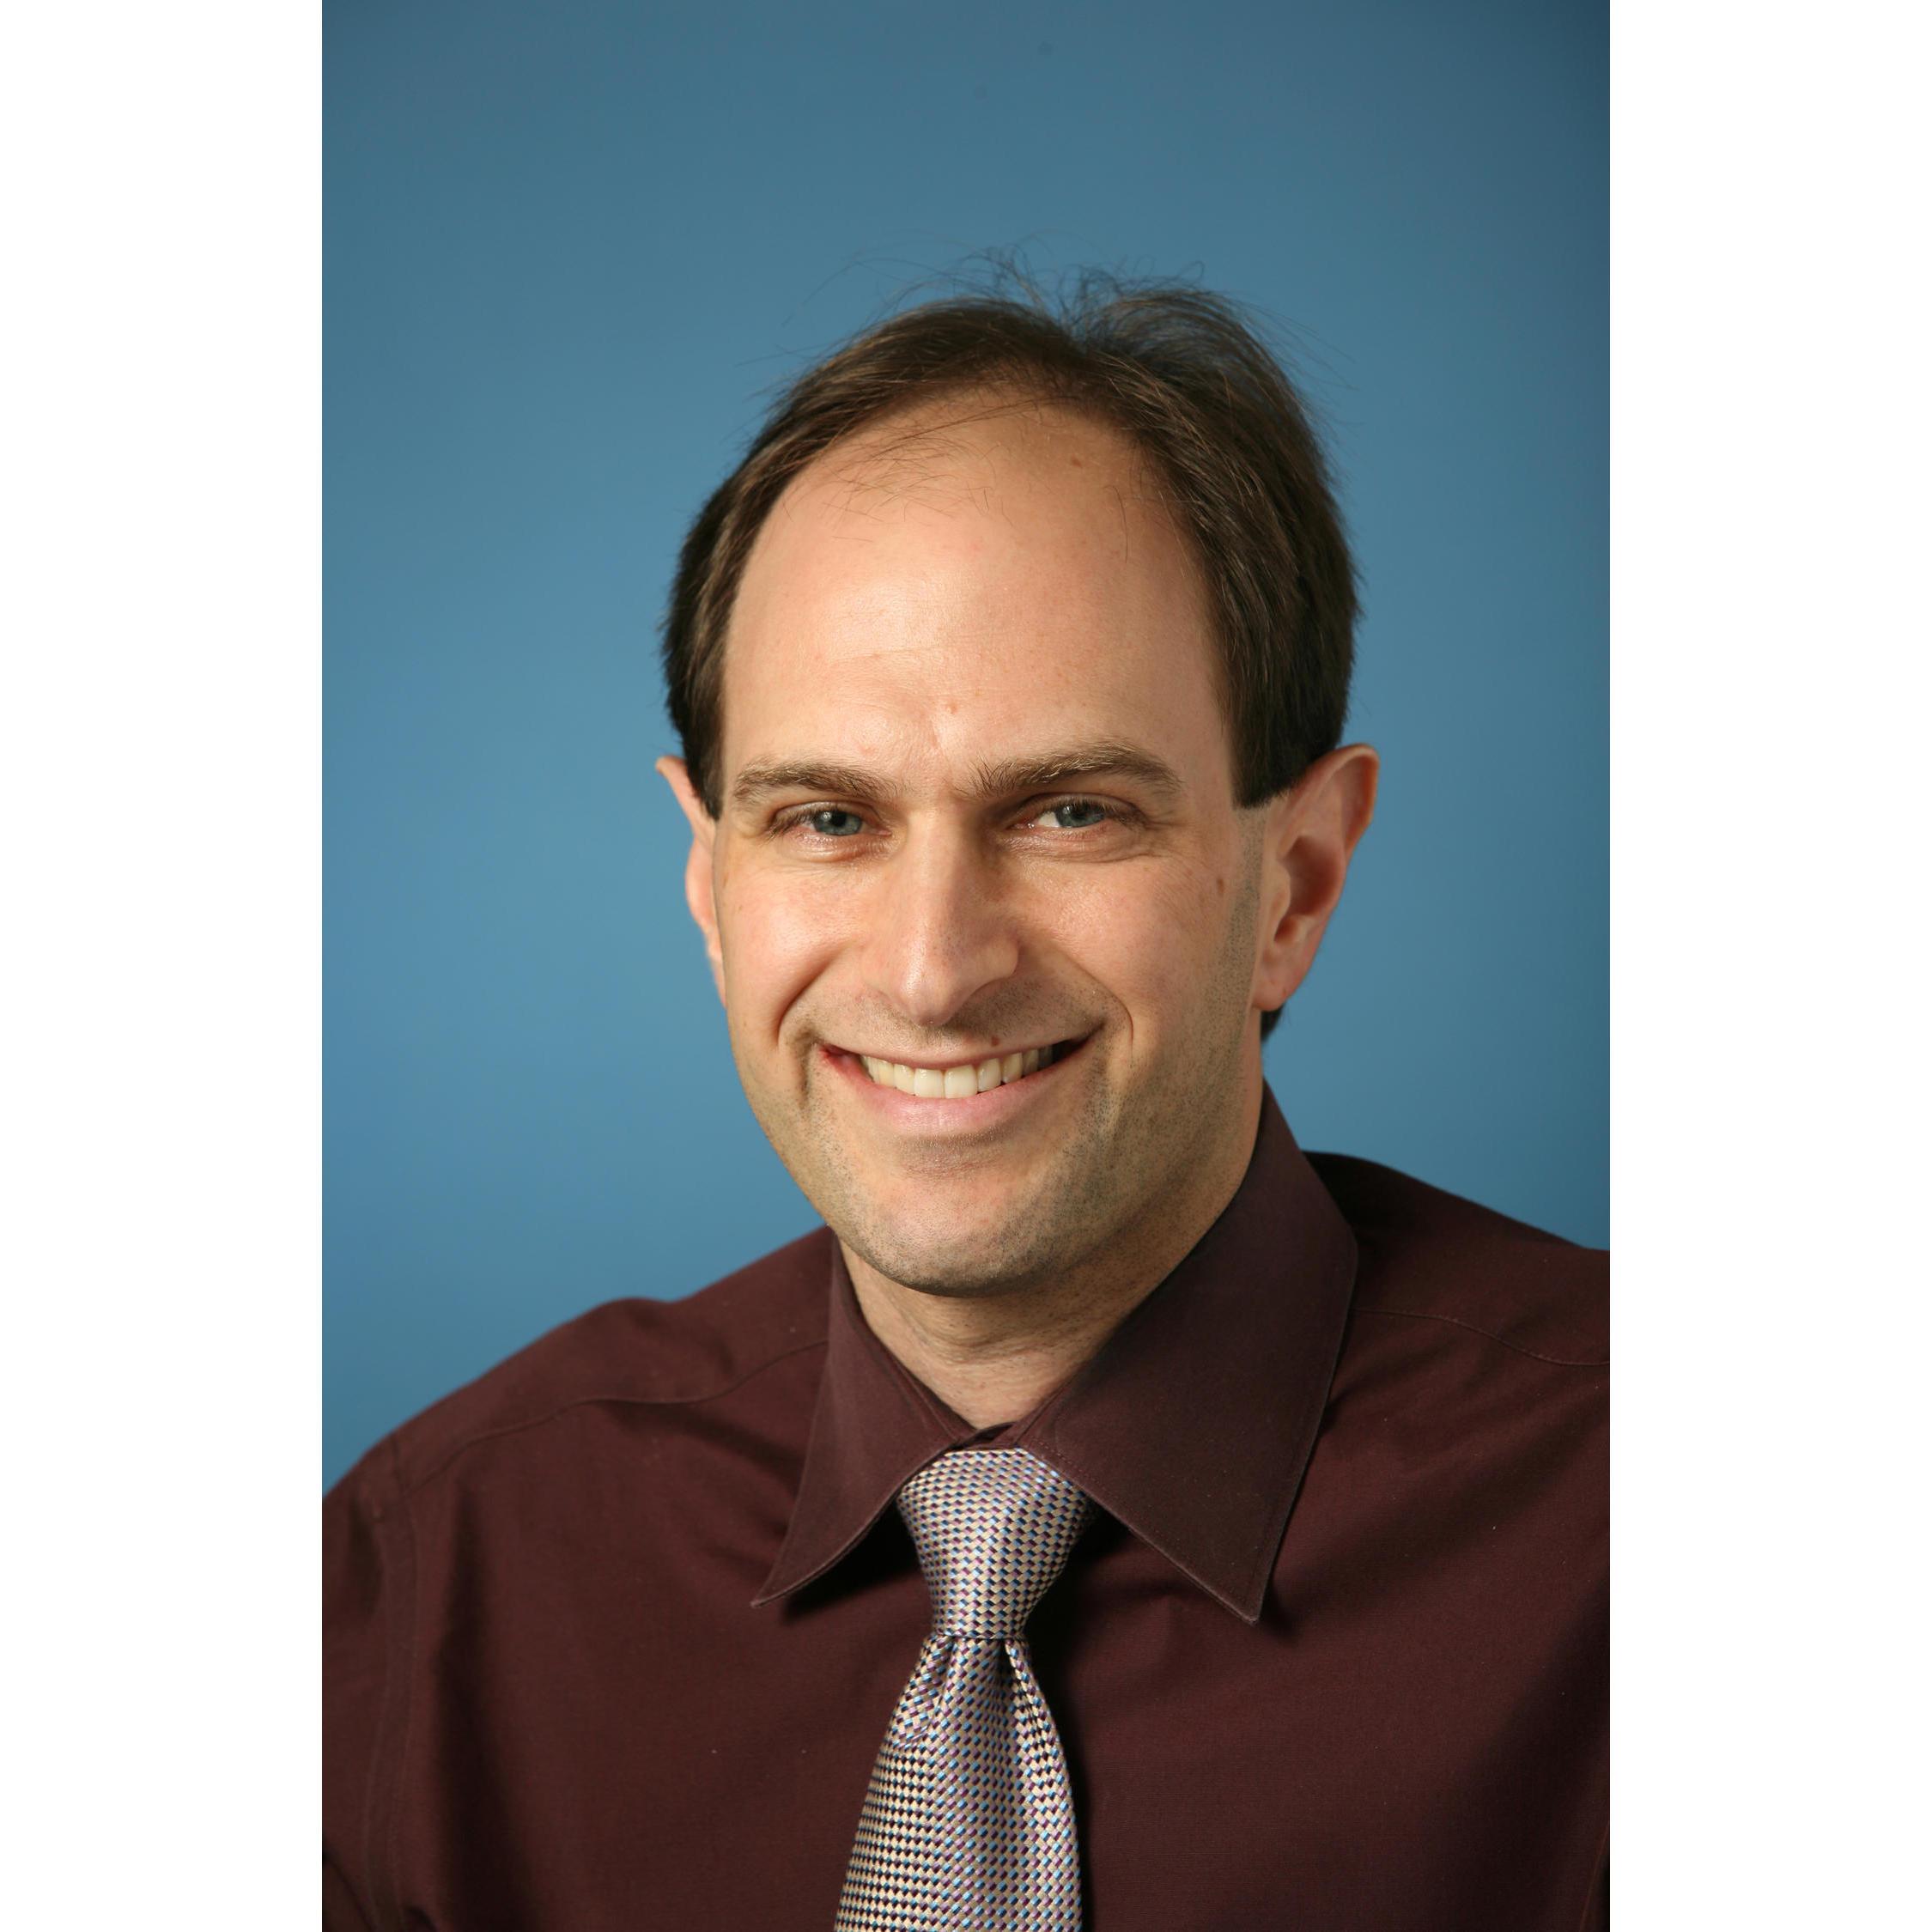 David J. Marcus, PHD